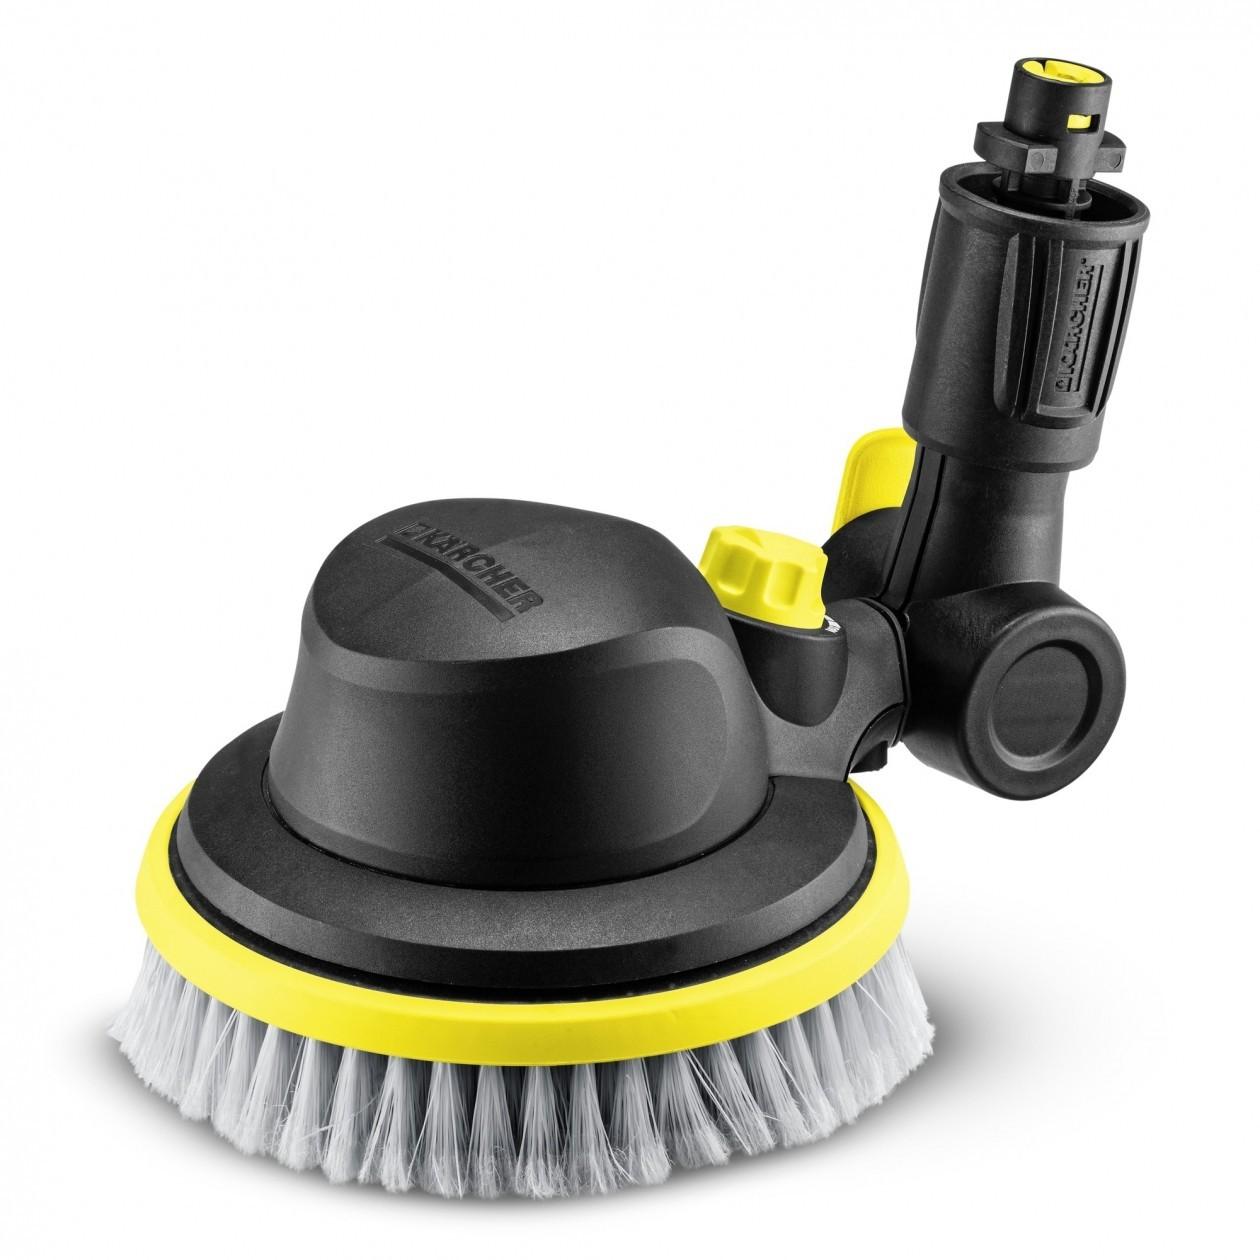 K 228 Rcher Wb 100 Rotating Wash Brush Sparestore Com